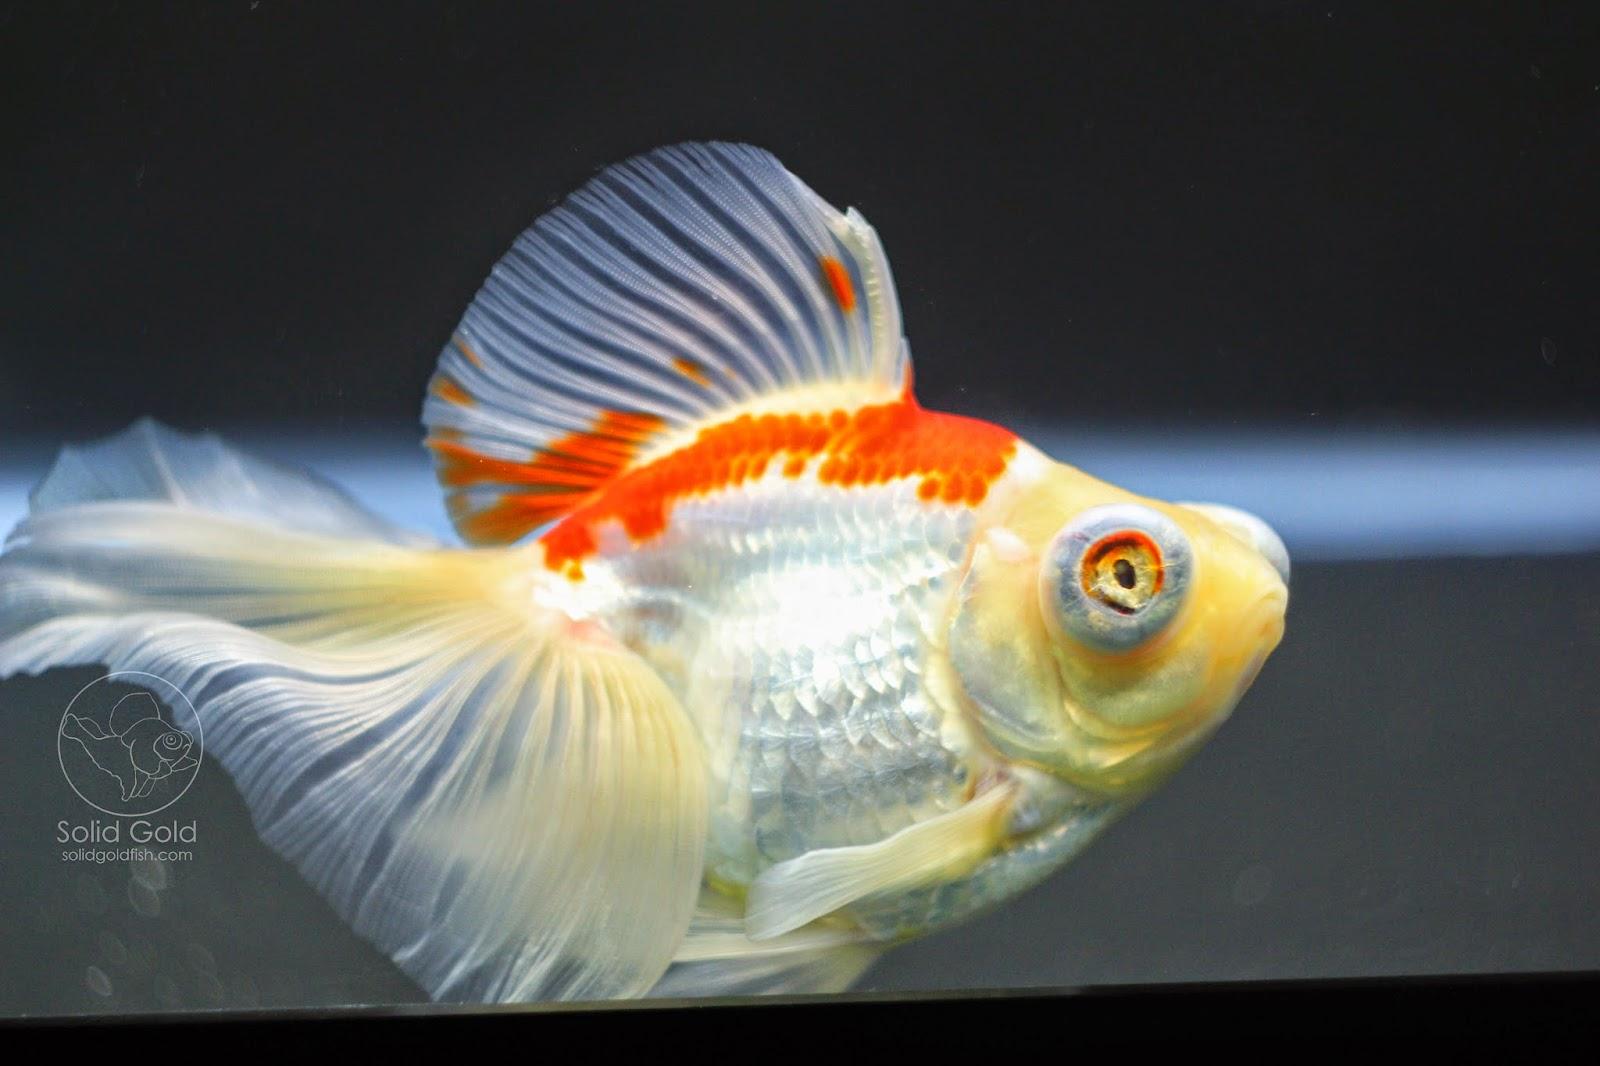 New fish from dandy orandas solid gold aquatics for Solid gold fish